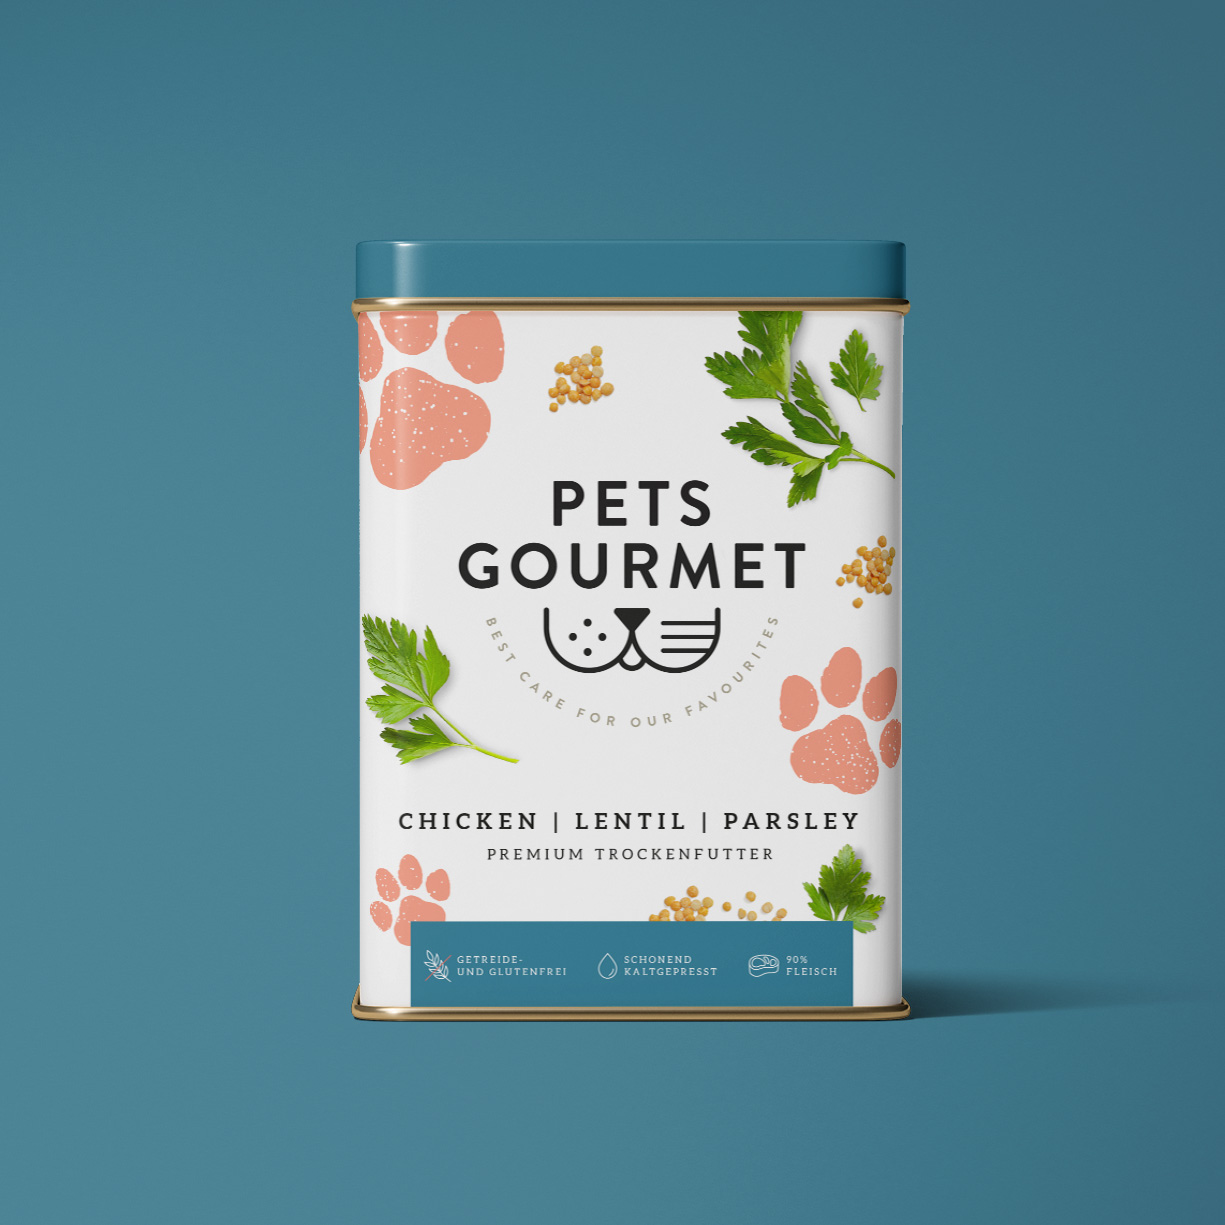 Pets_Gourmet_01